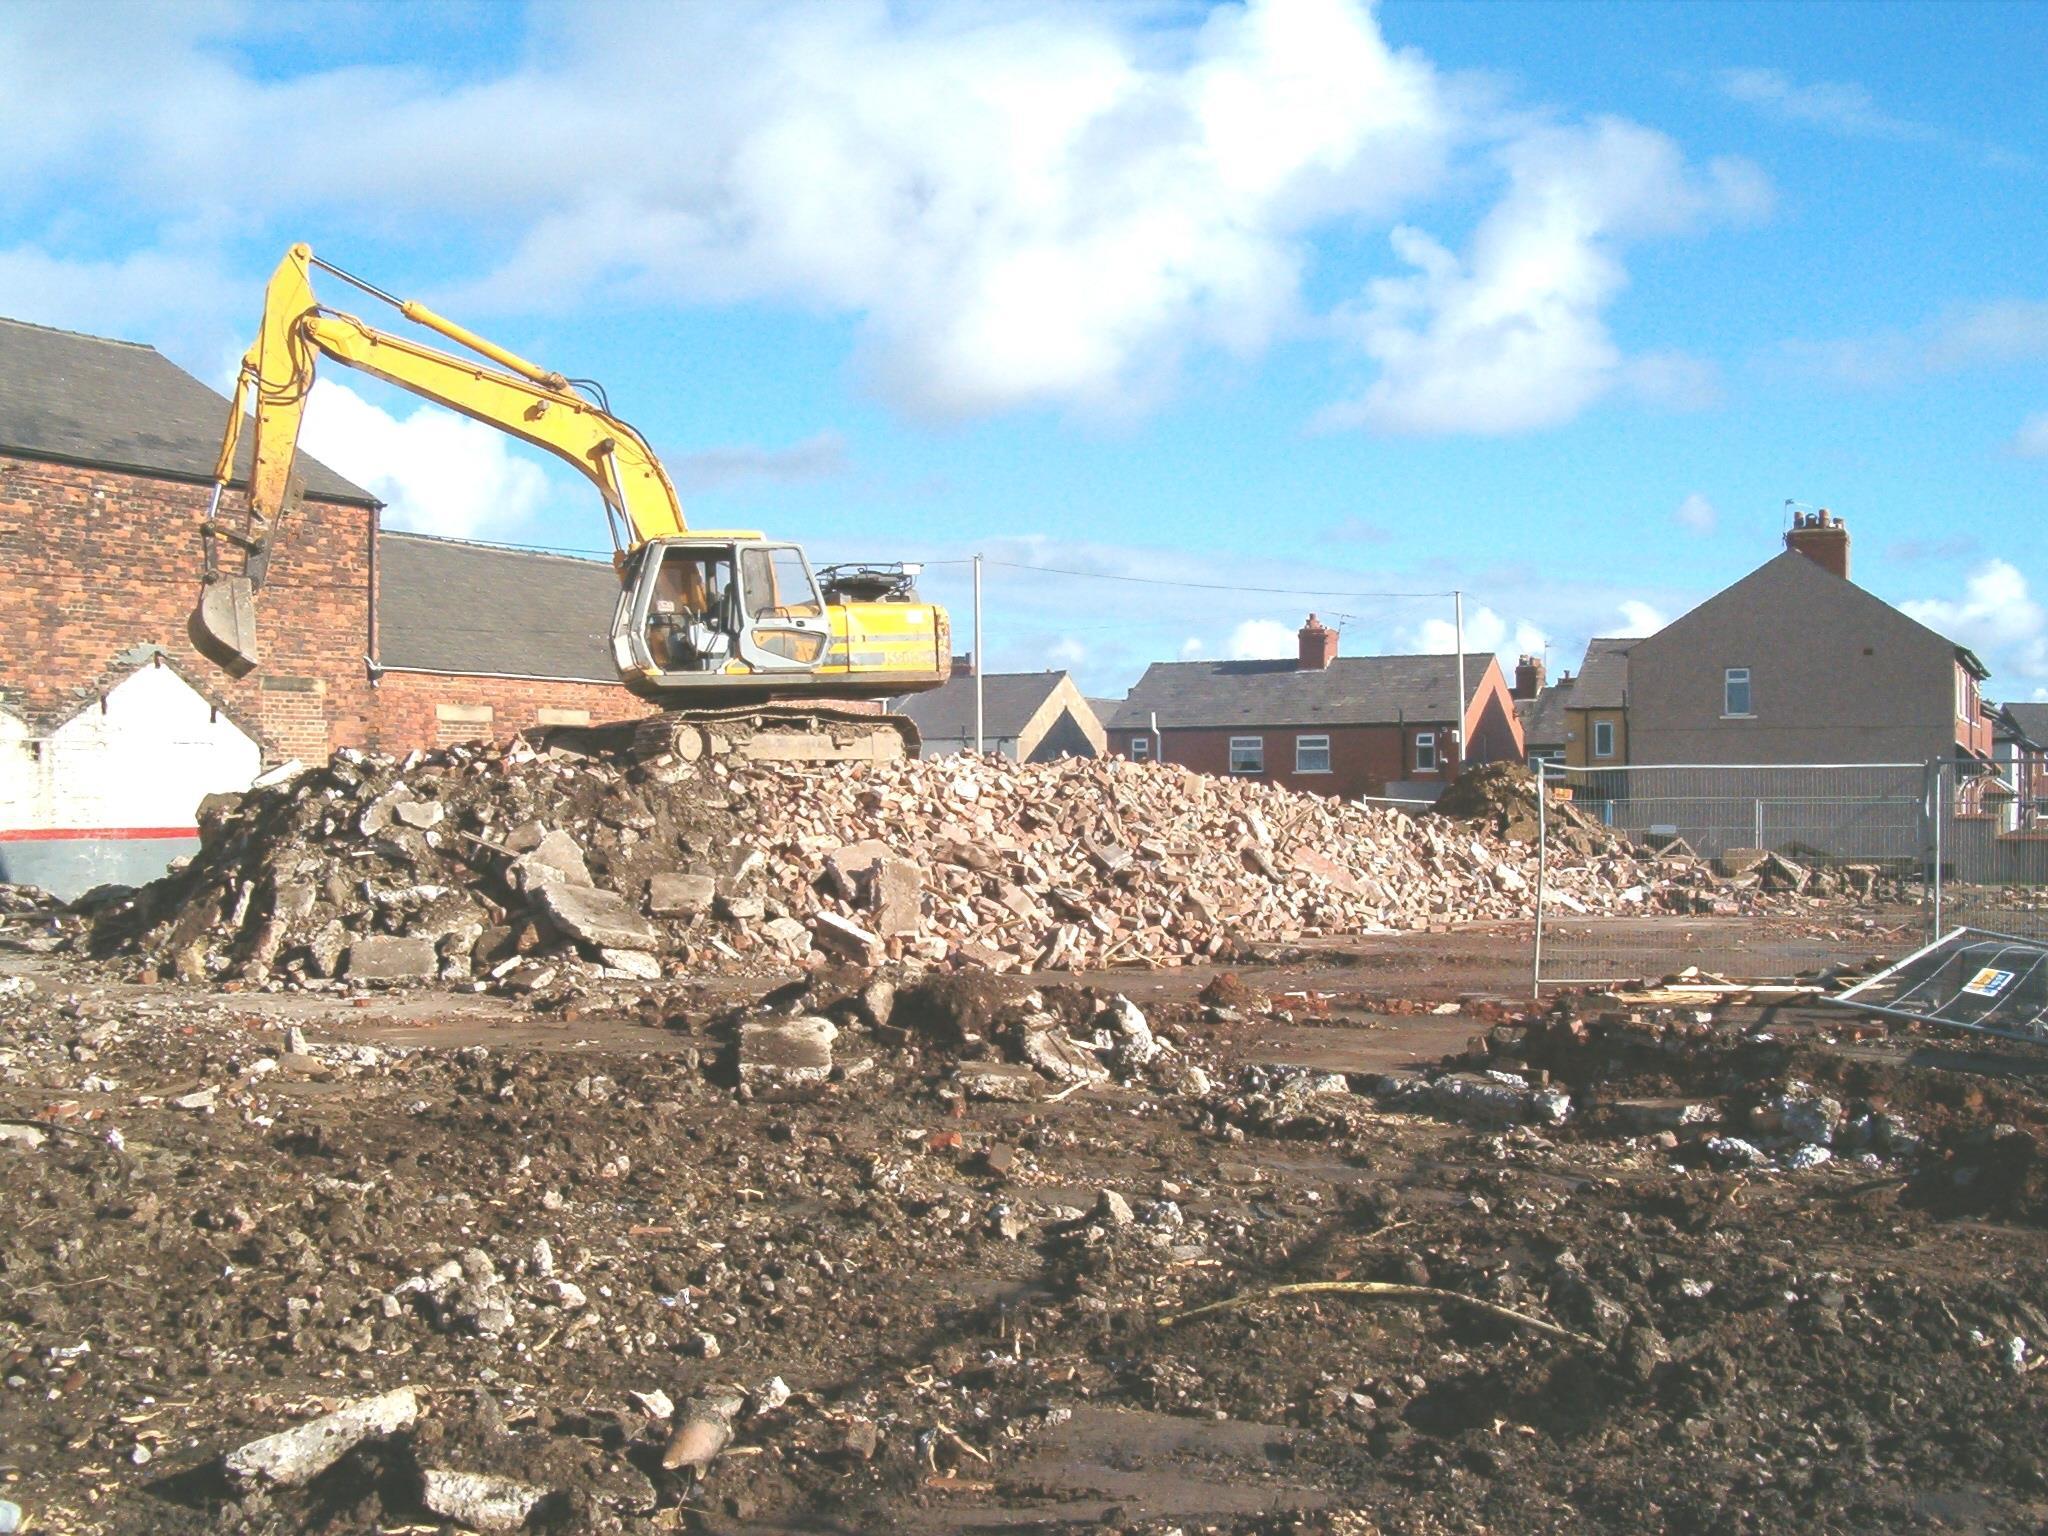 Blackpool factory ir demolition and groundworks ltd for Demolition wood for sale